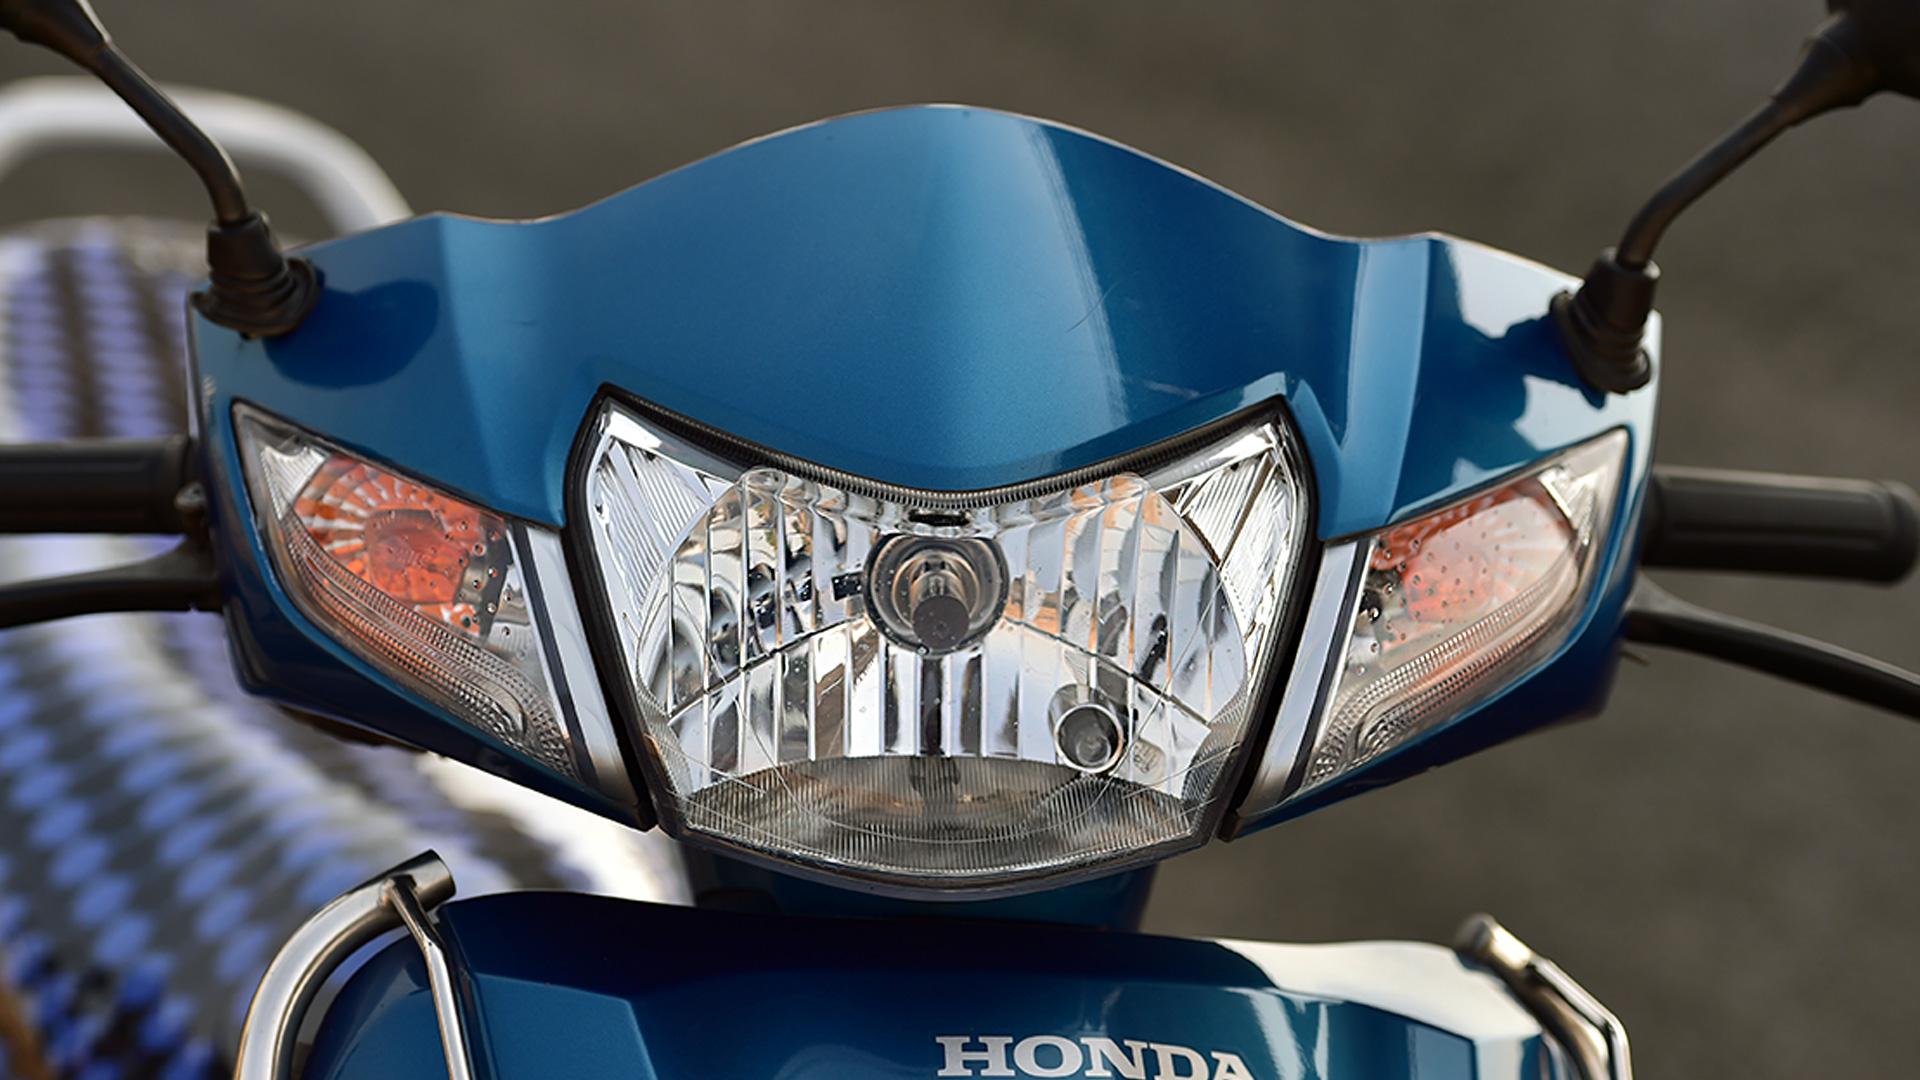 Ray Price Honda >> Honda Activa 2017 - Price, Mileage, Reviews, Specification ...